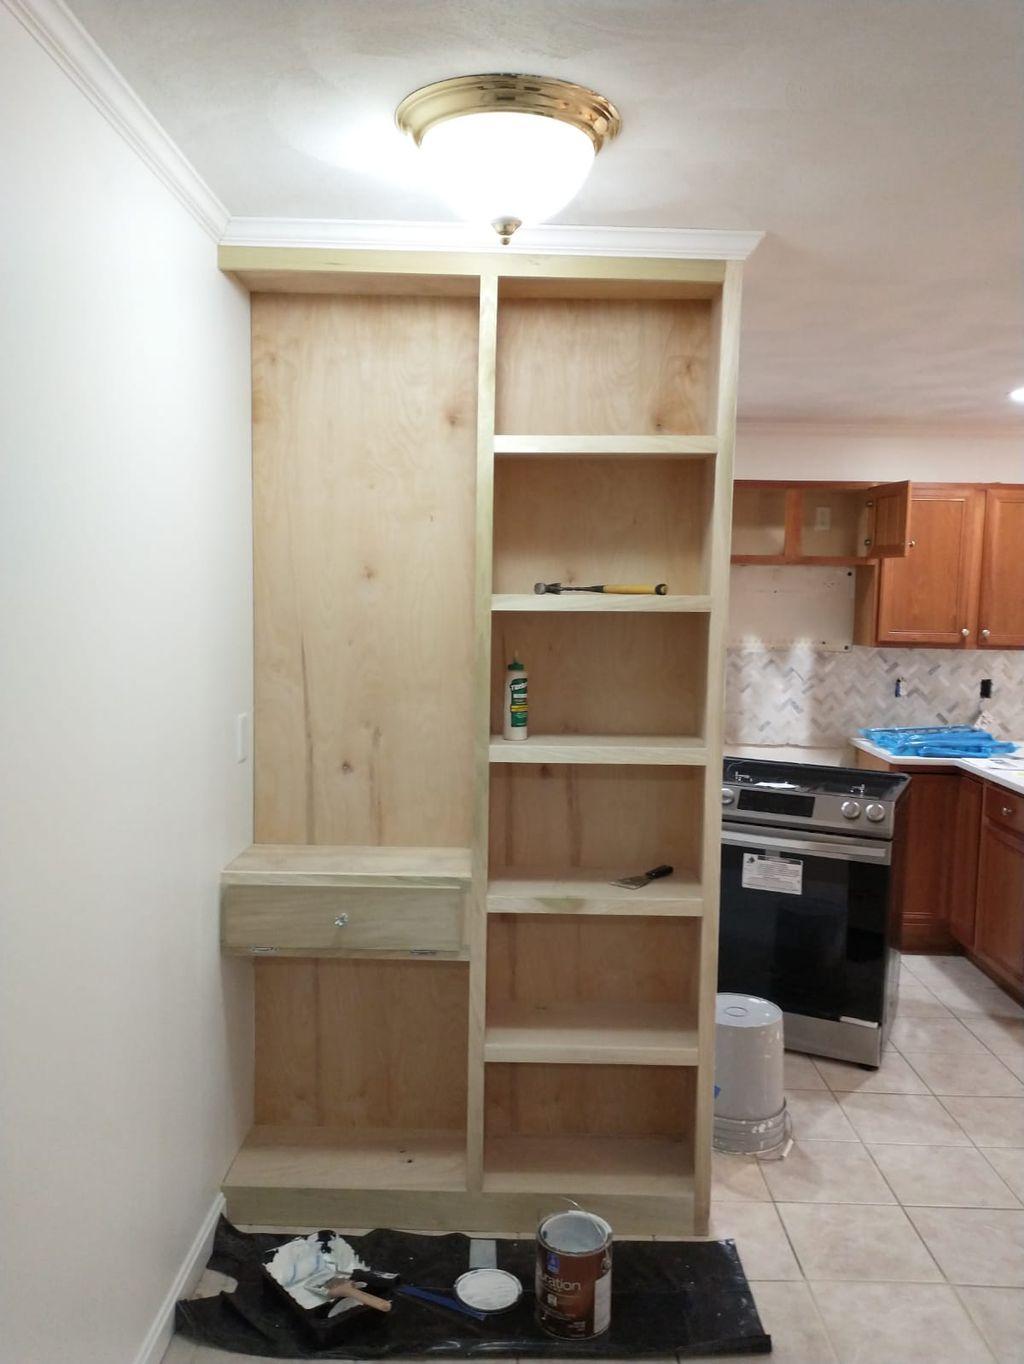 Custom bookshelf and paint